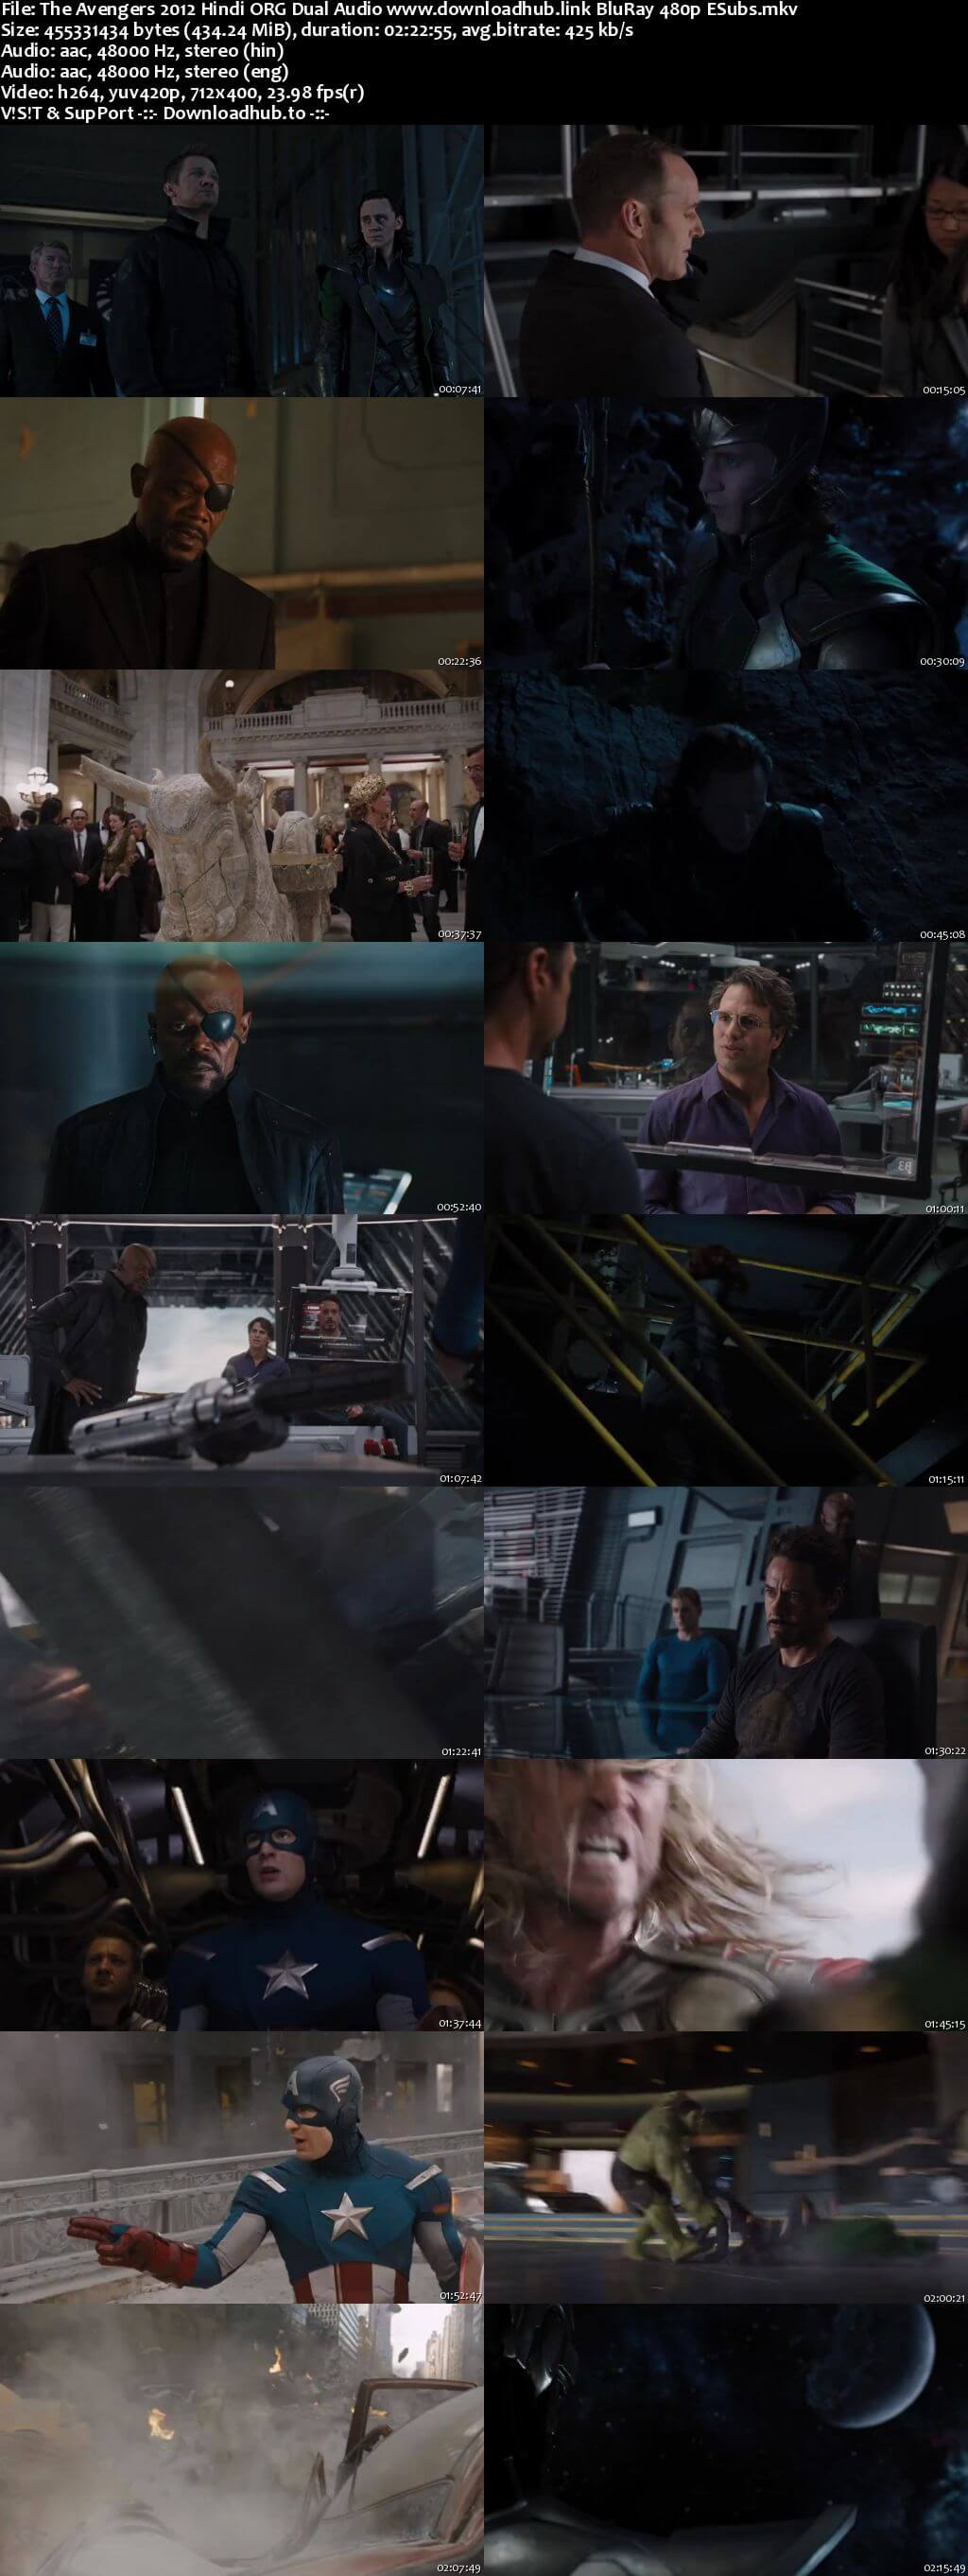 The Avengers 2012 Hindi ORG Dual Audio 400MB BluRay 480p ESubs